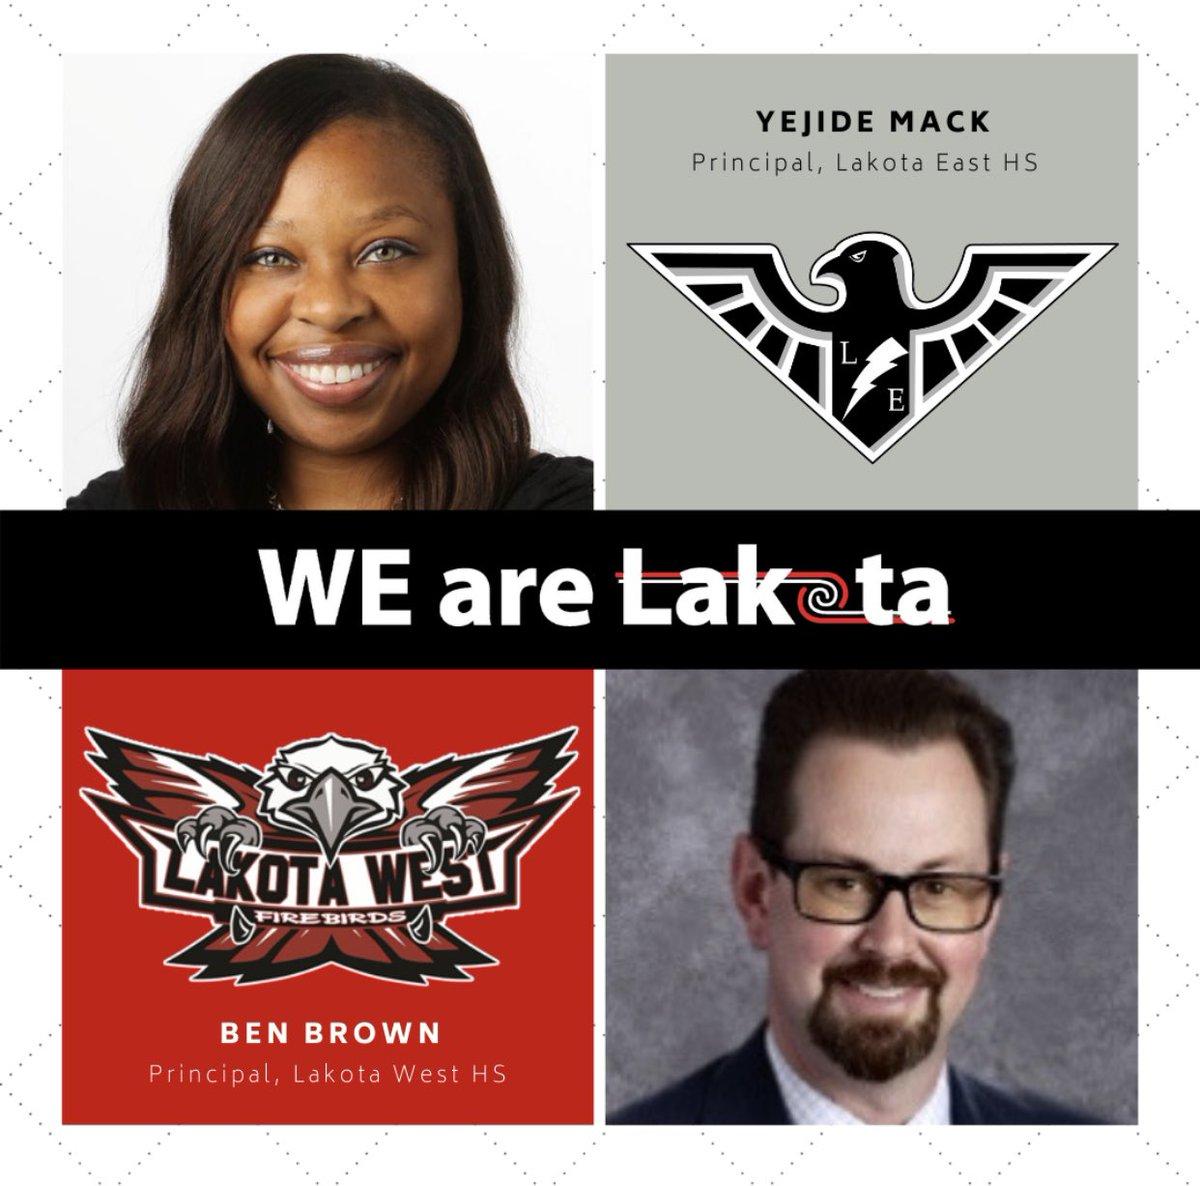 The Firebird Family welcomes new Lakota West Principal, Mr. Ben Brown and new Lakota East Principal, Dr. Yejide Mack!! #WEareLakota  #WeAreInThisTogether https://t.co/FvsJkuL4dG https://t.co/QkUElbdJCD